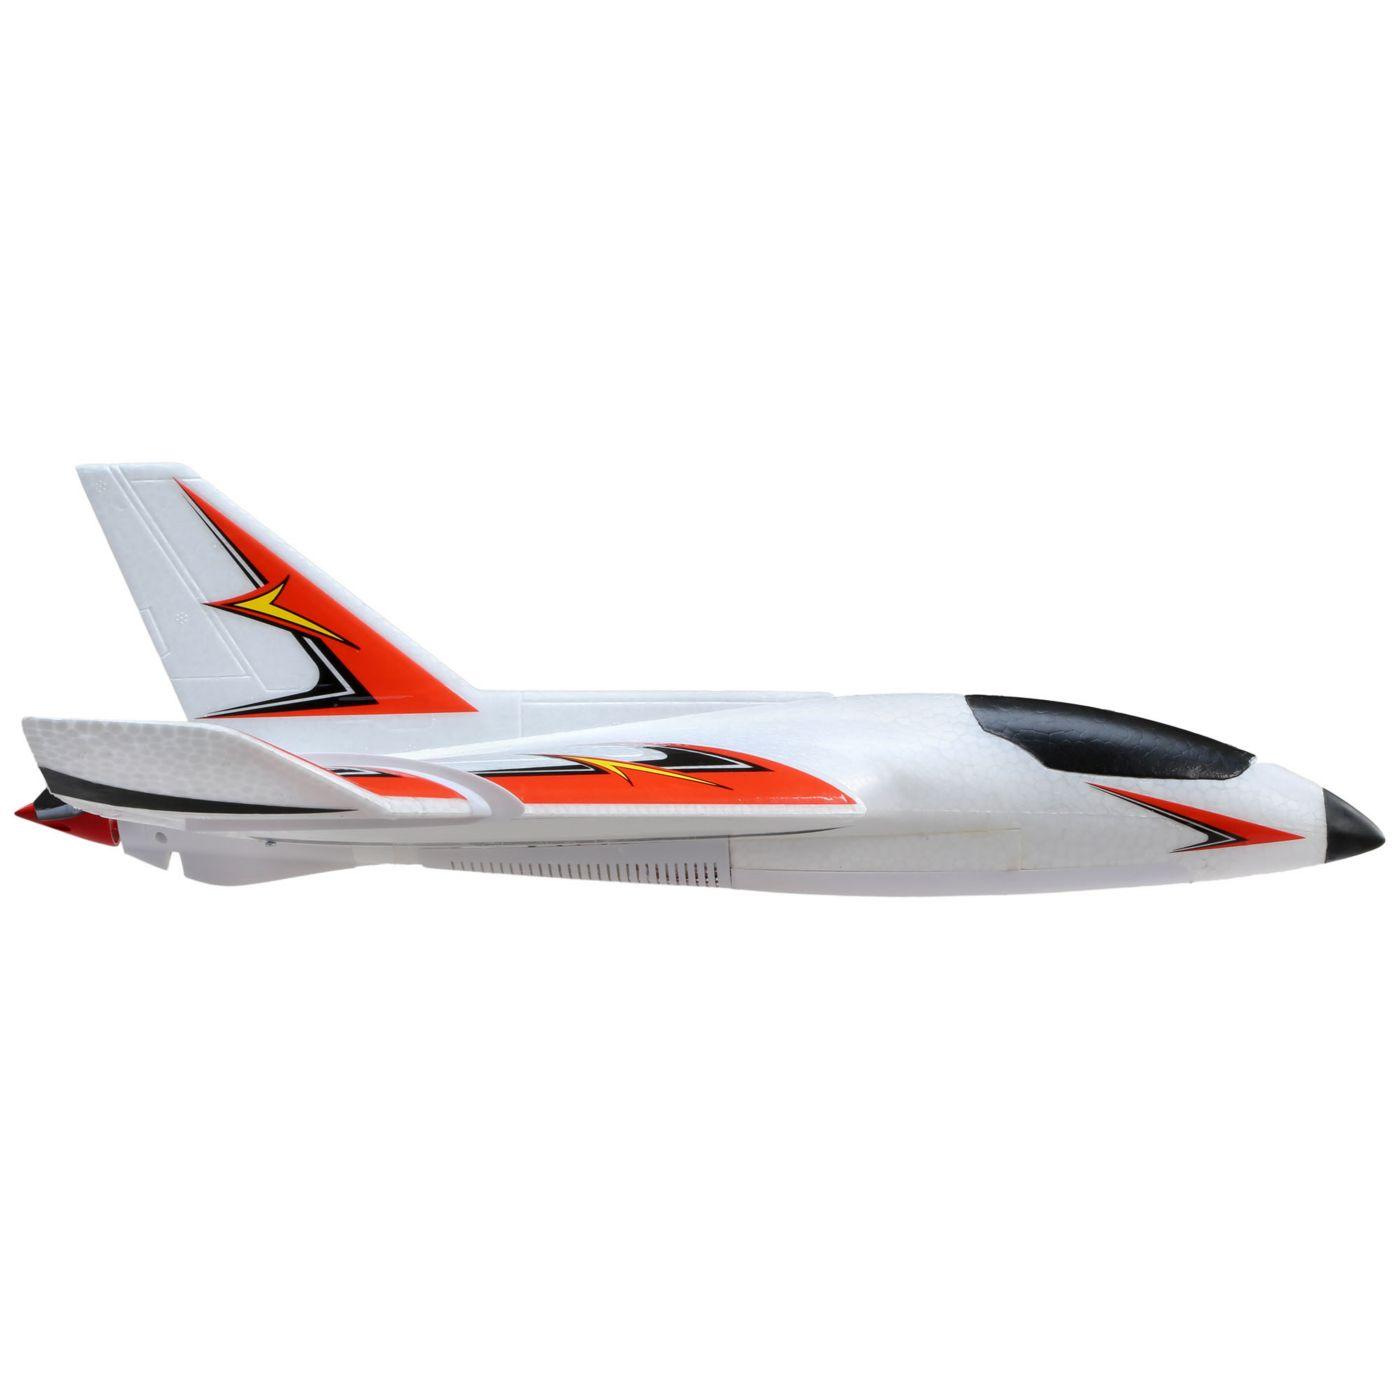 Delta Ray One E-flite